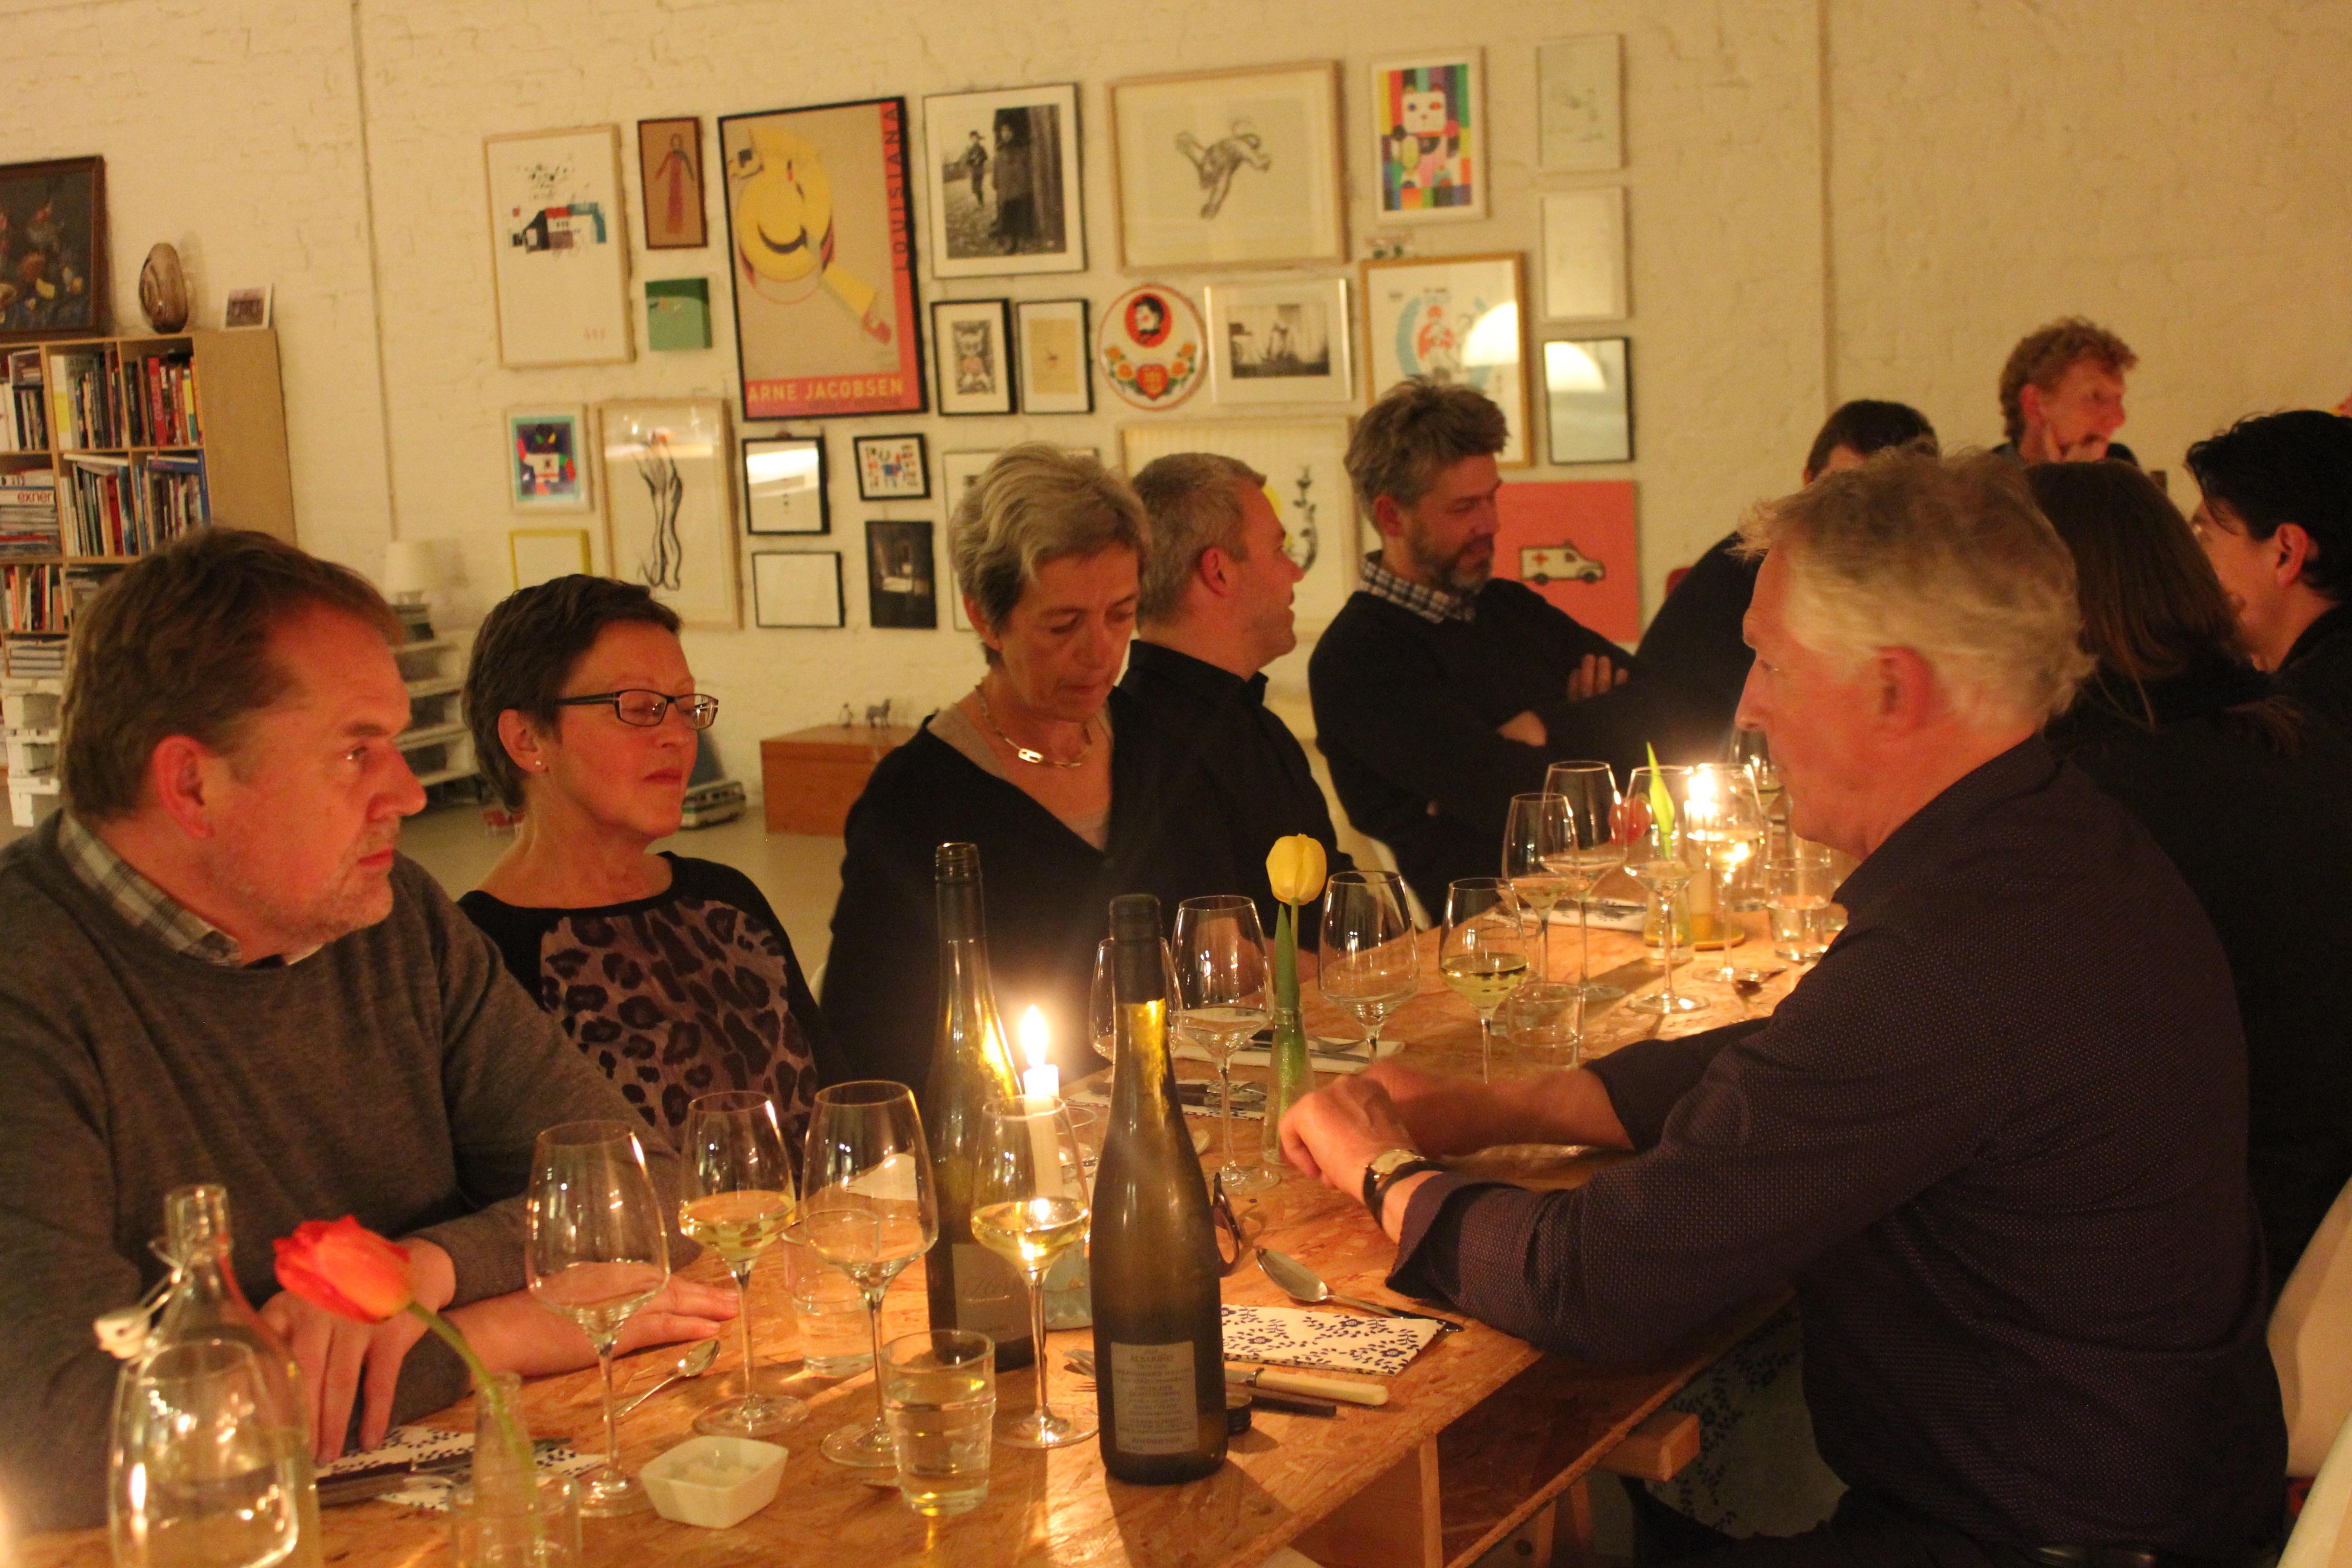 Urban Safari Berlin & Camillo's Paladar in the Lower East Lab, May 2015 ©lowereast